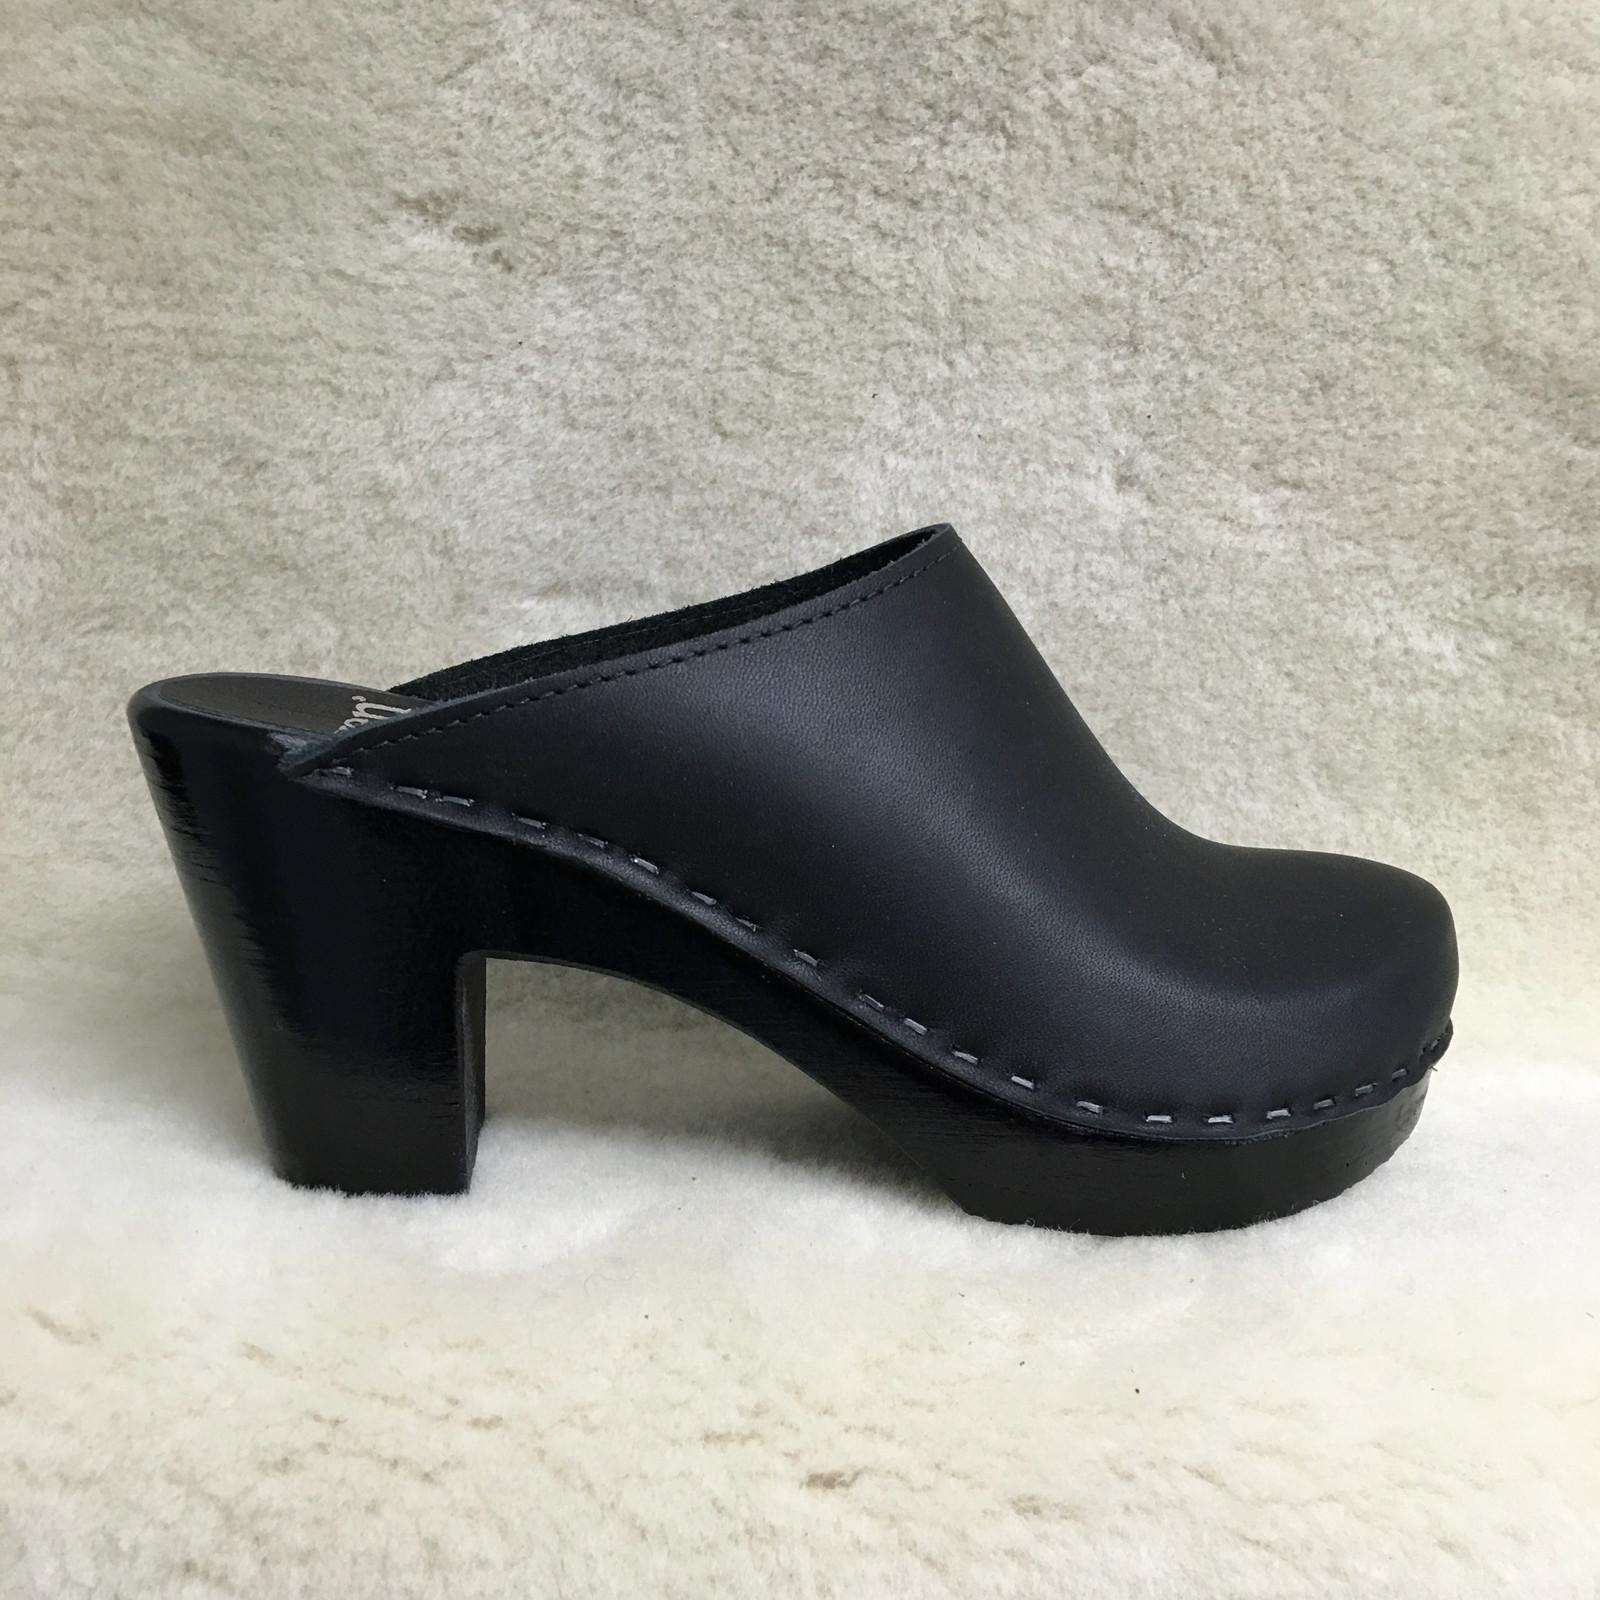 Plain Clogs -  High Heels - Black Base Only